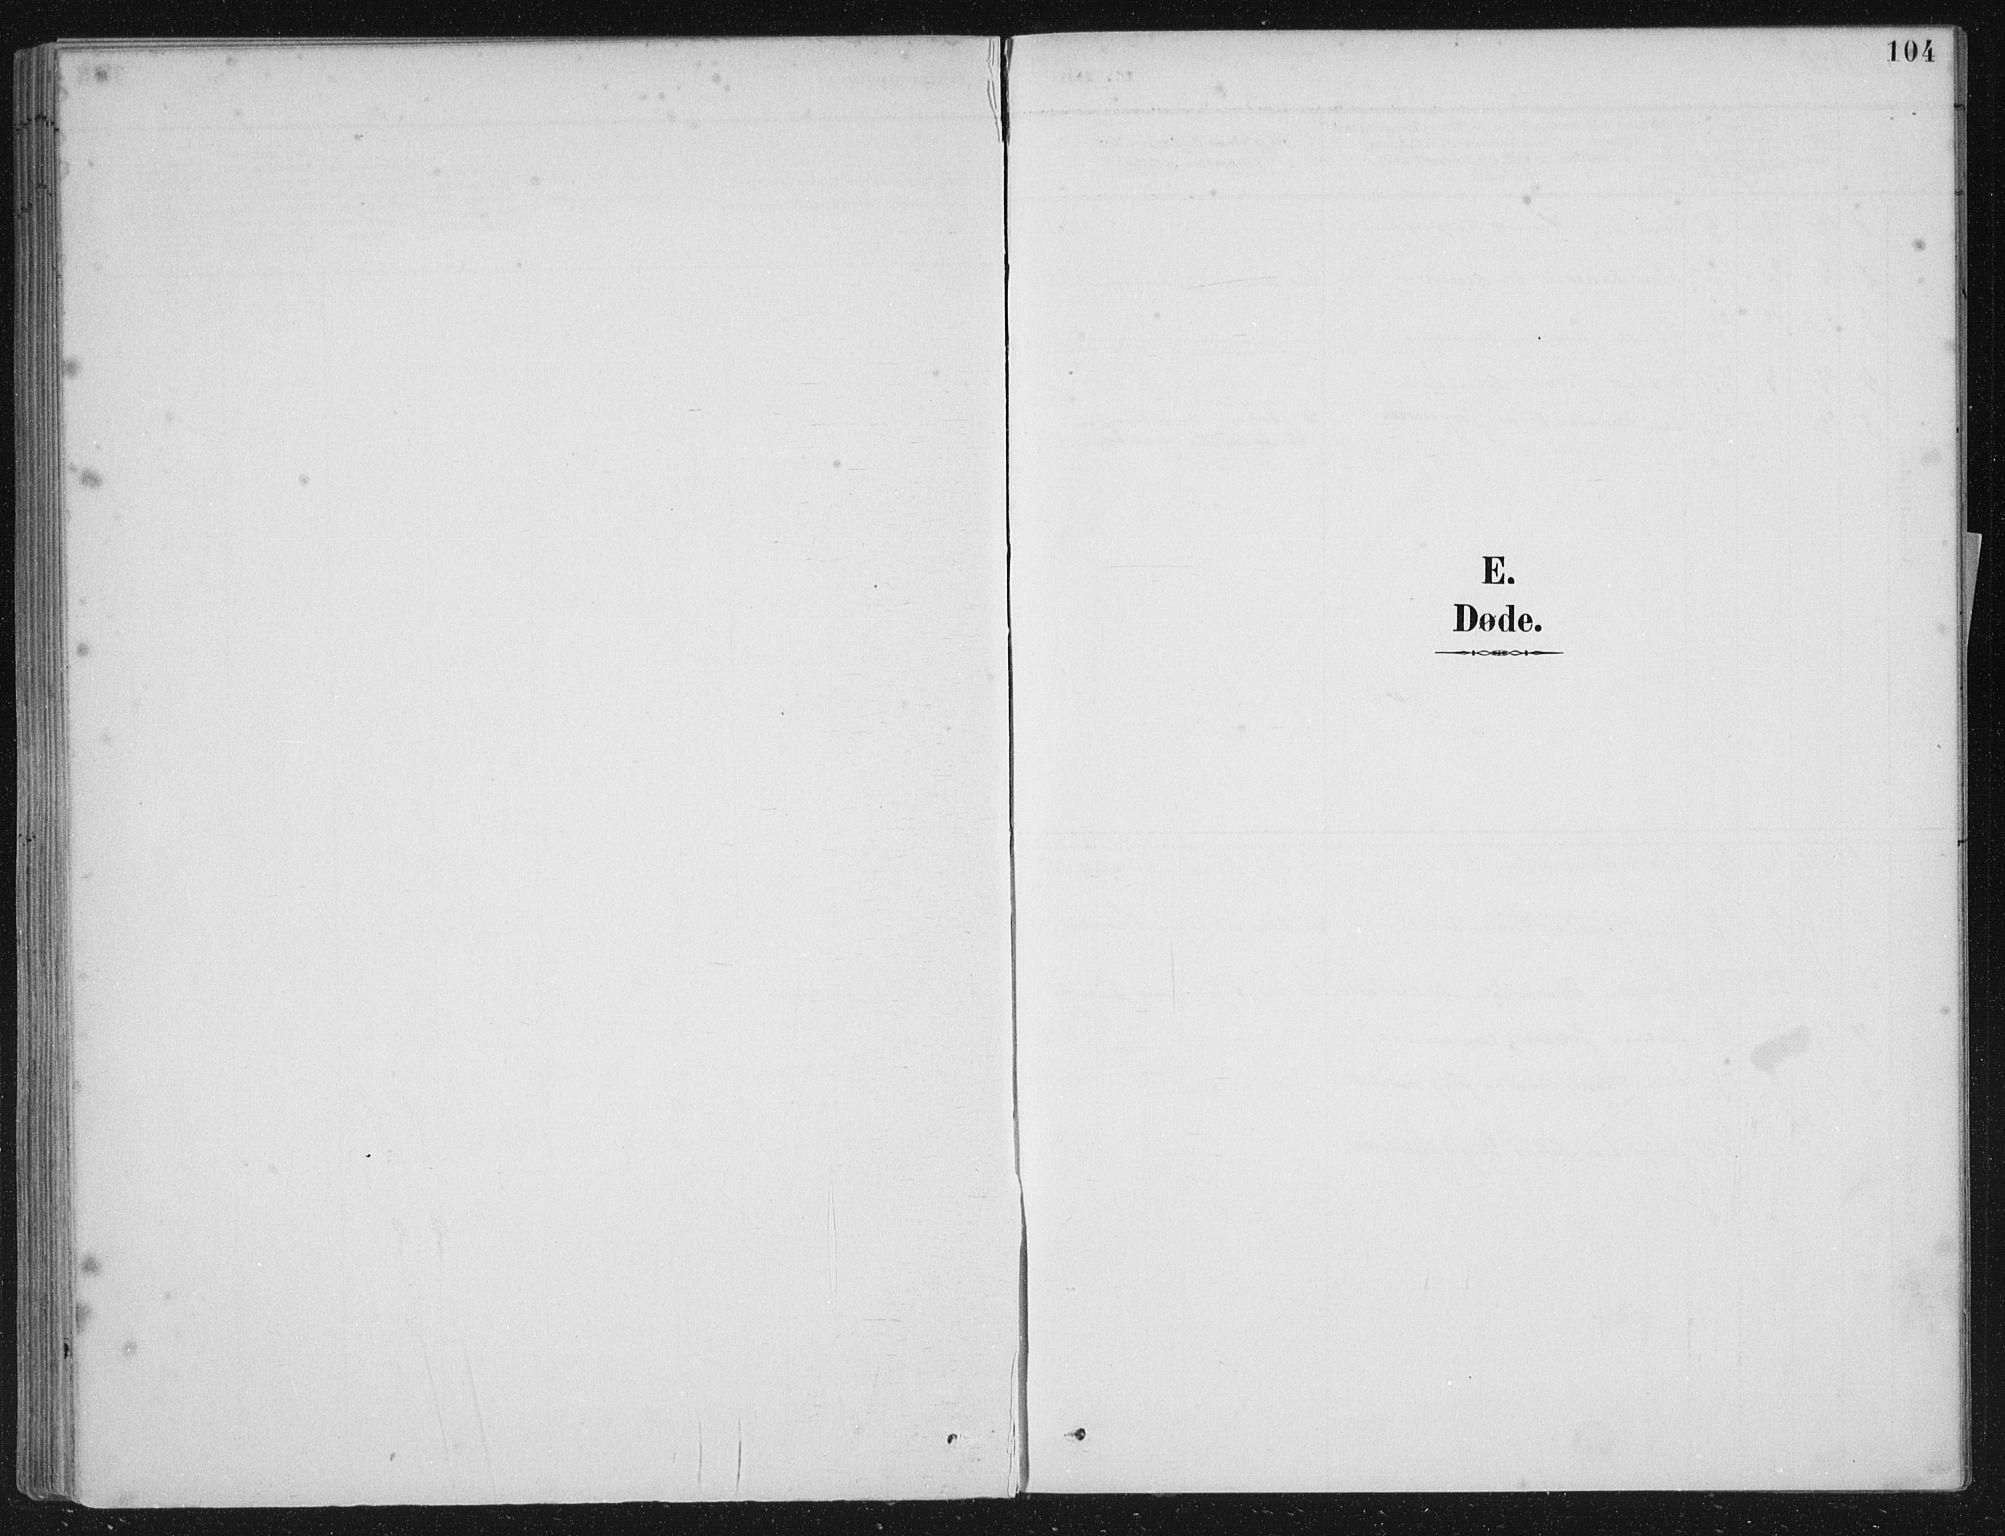 SAB, Kinn sokneprestembete, H/Haa/Haae/L0001: Ministerialbok nr. E 1, 1890-1916, s. 104